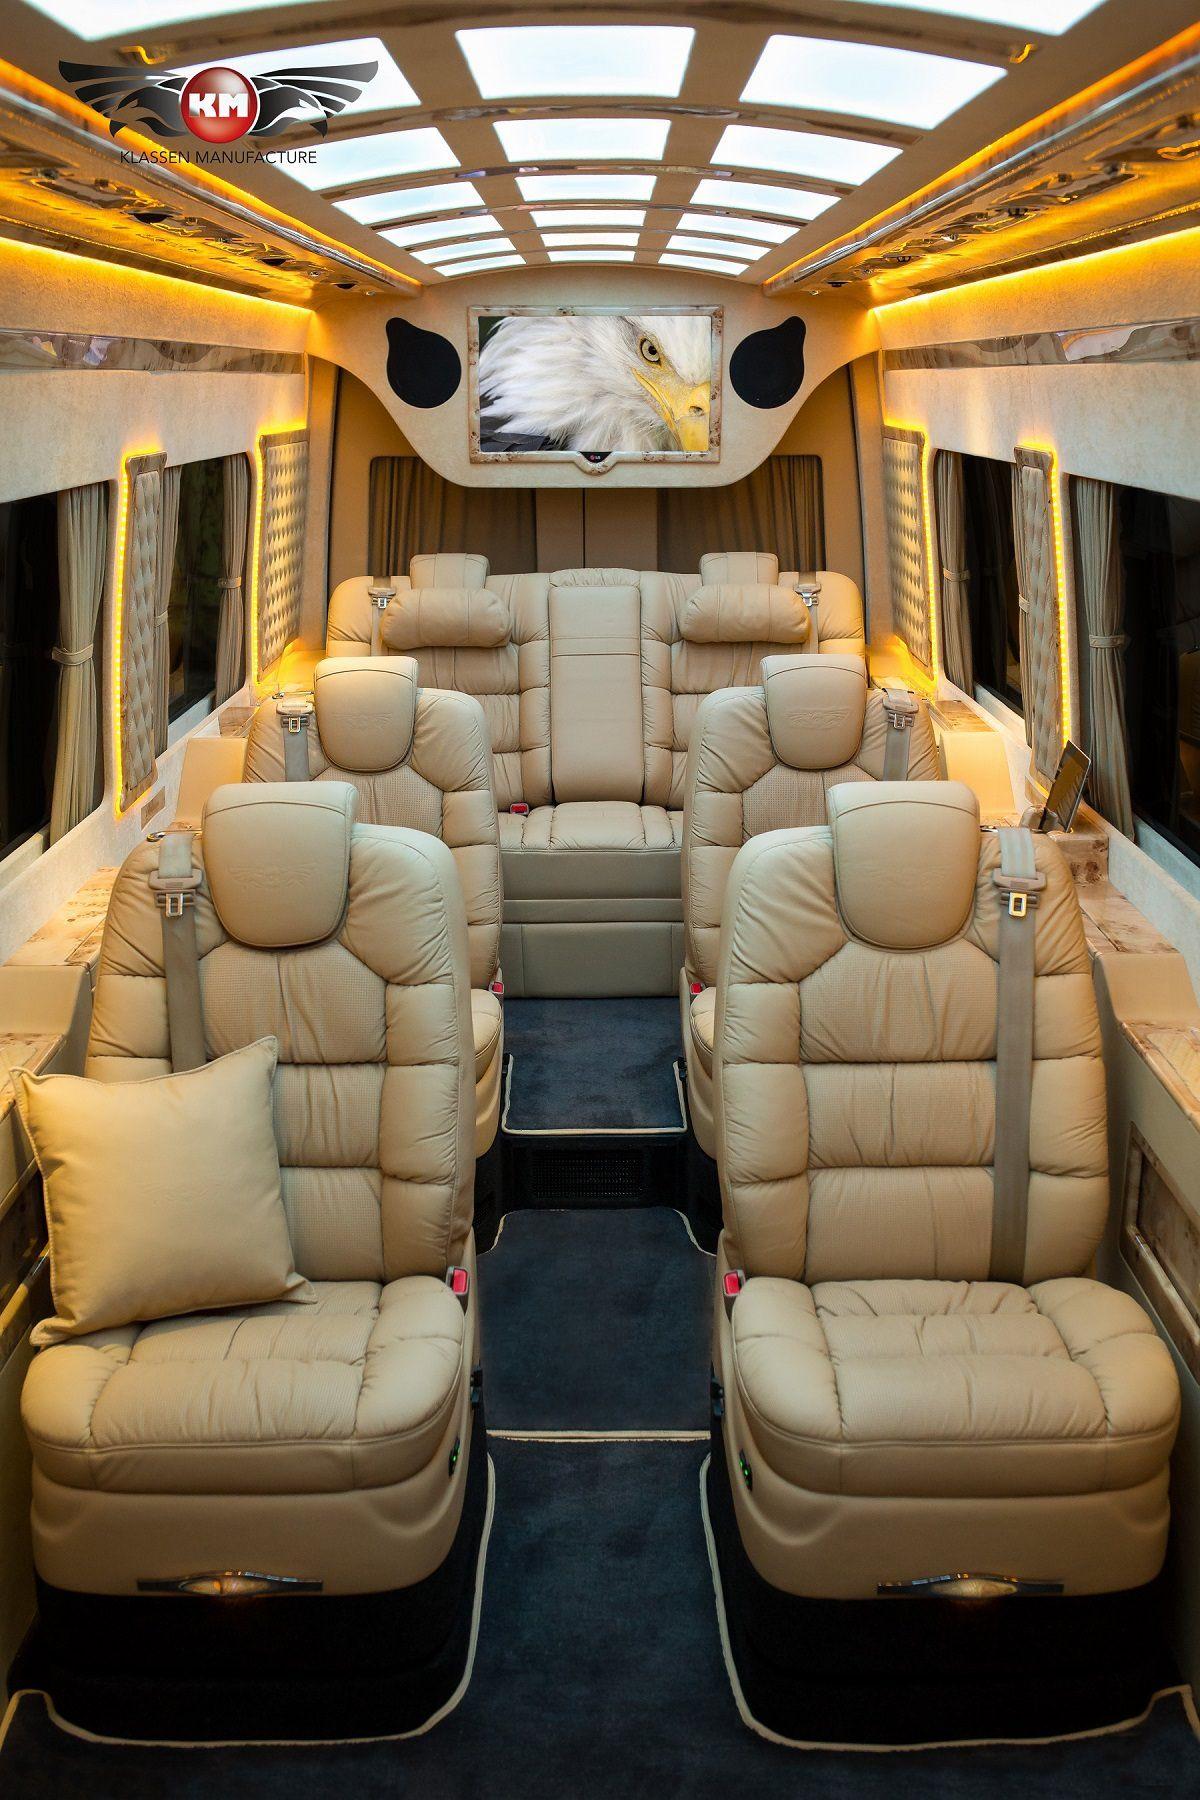 Klassen Manufacture Luxury Vip Cars Vans And Busses Mercedes